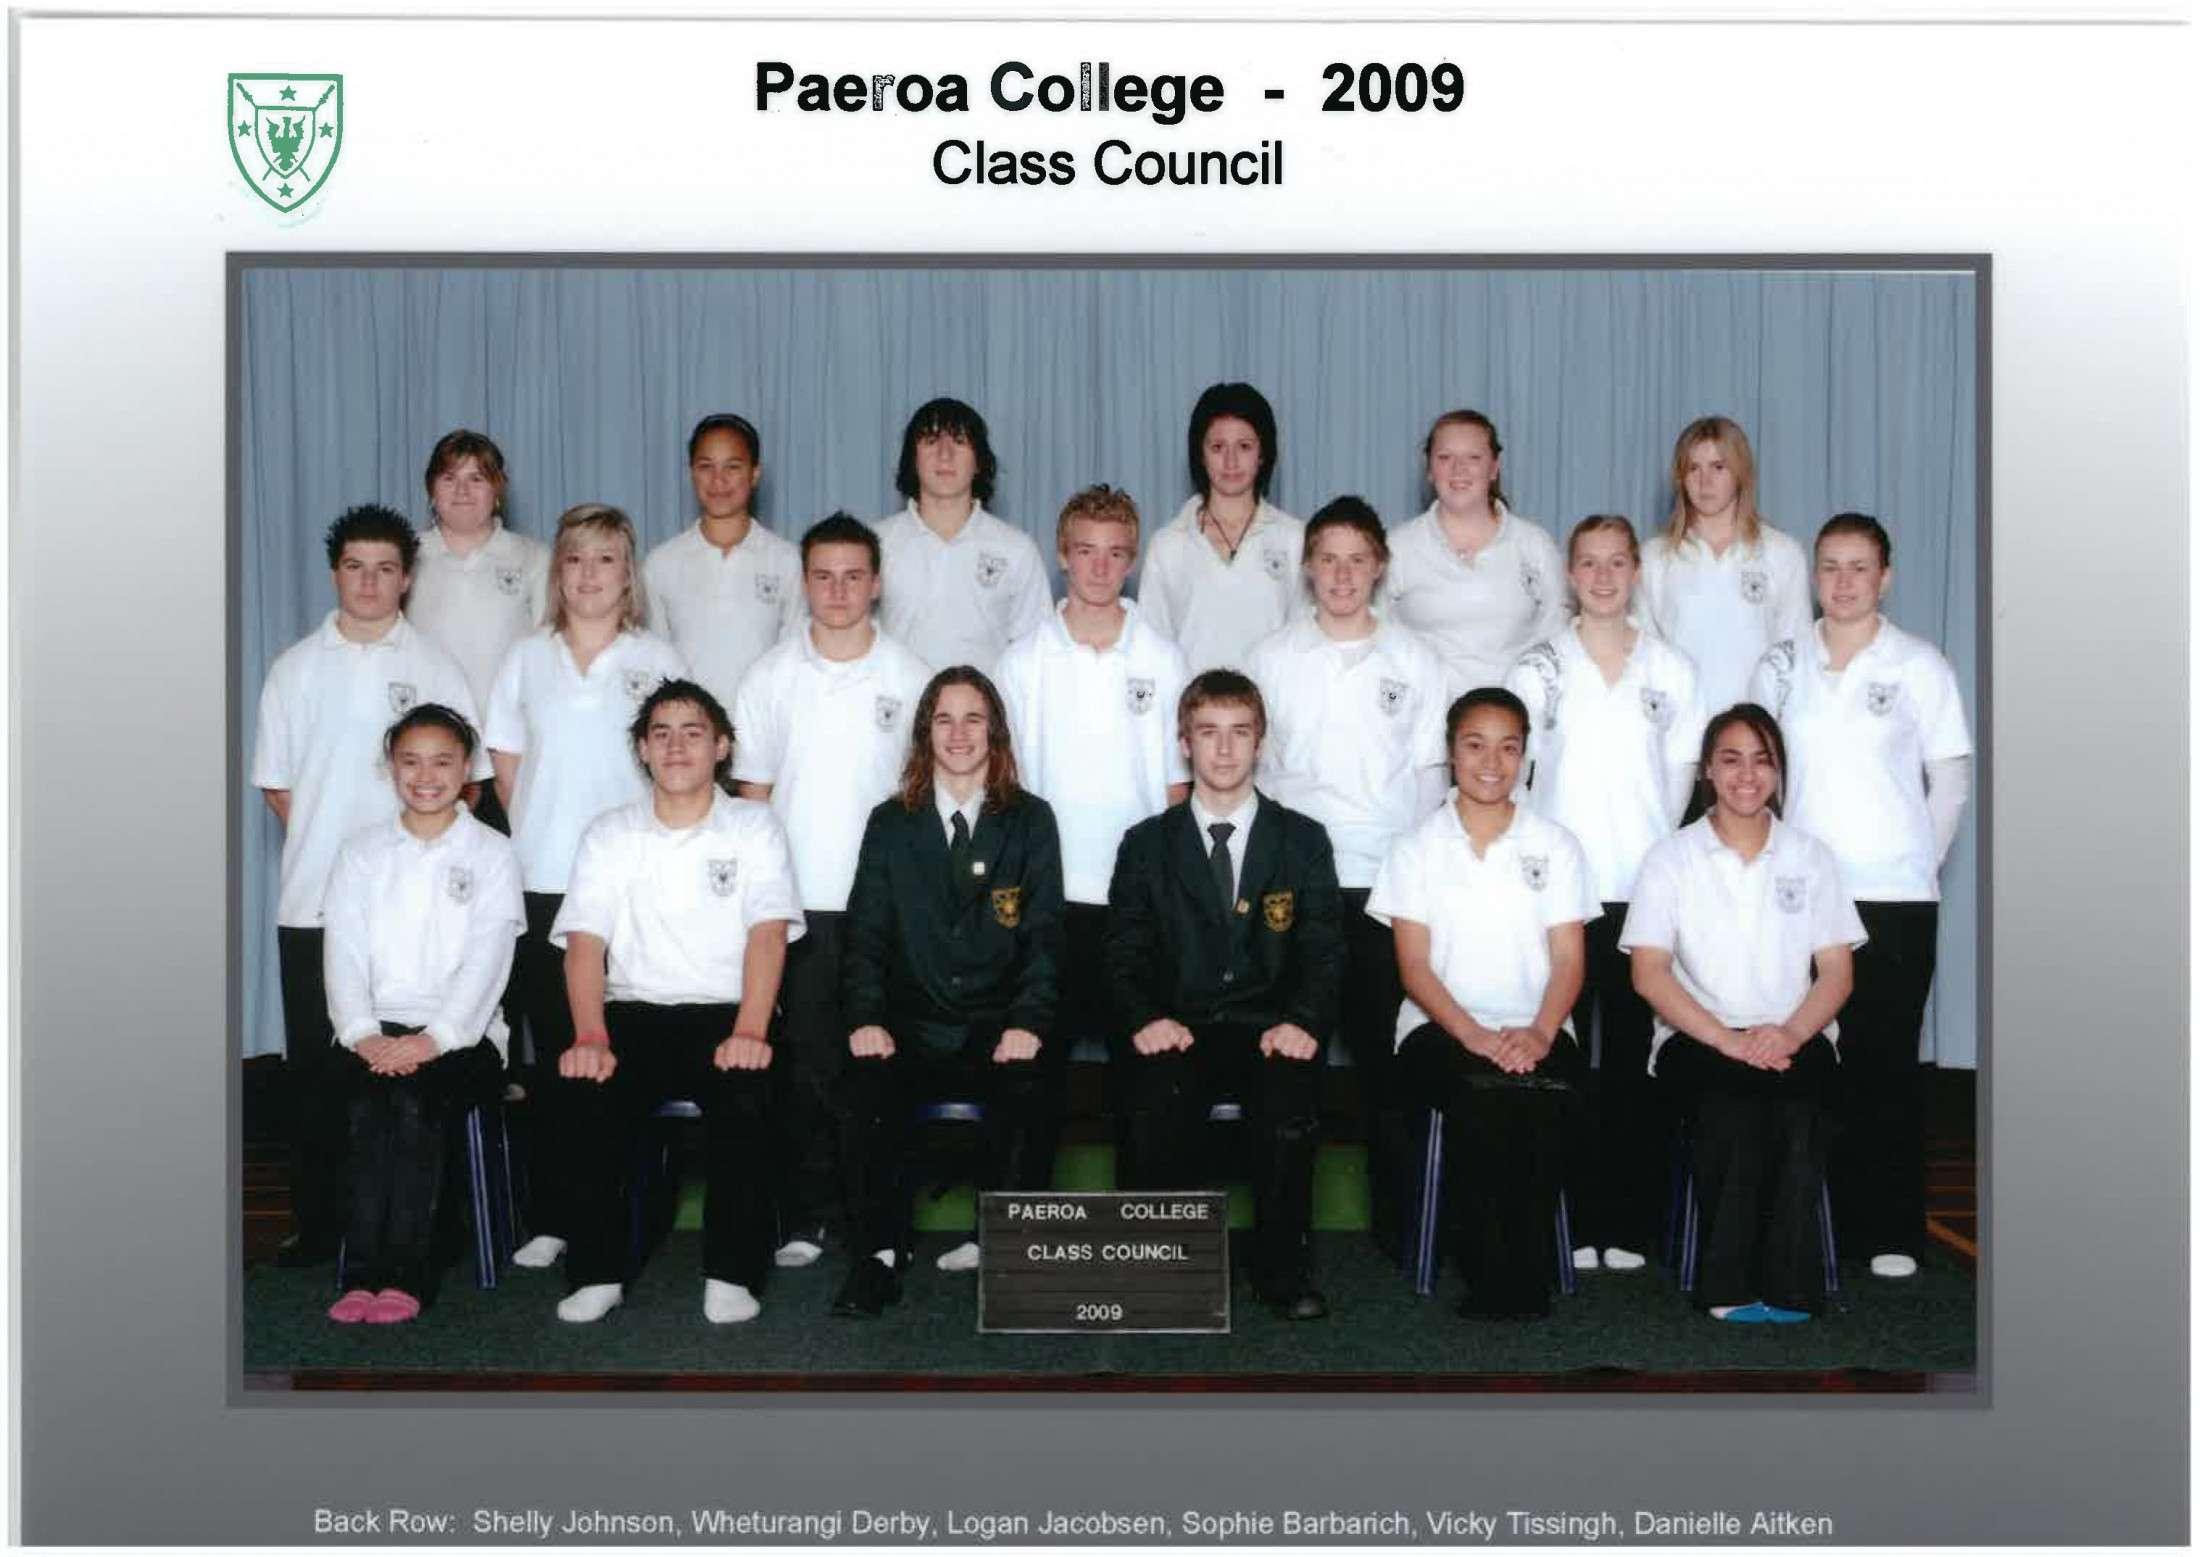 2009 Class Council